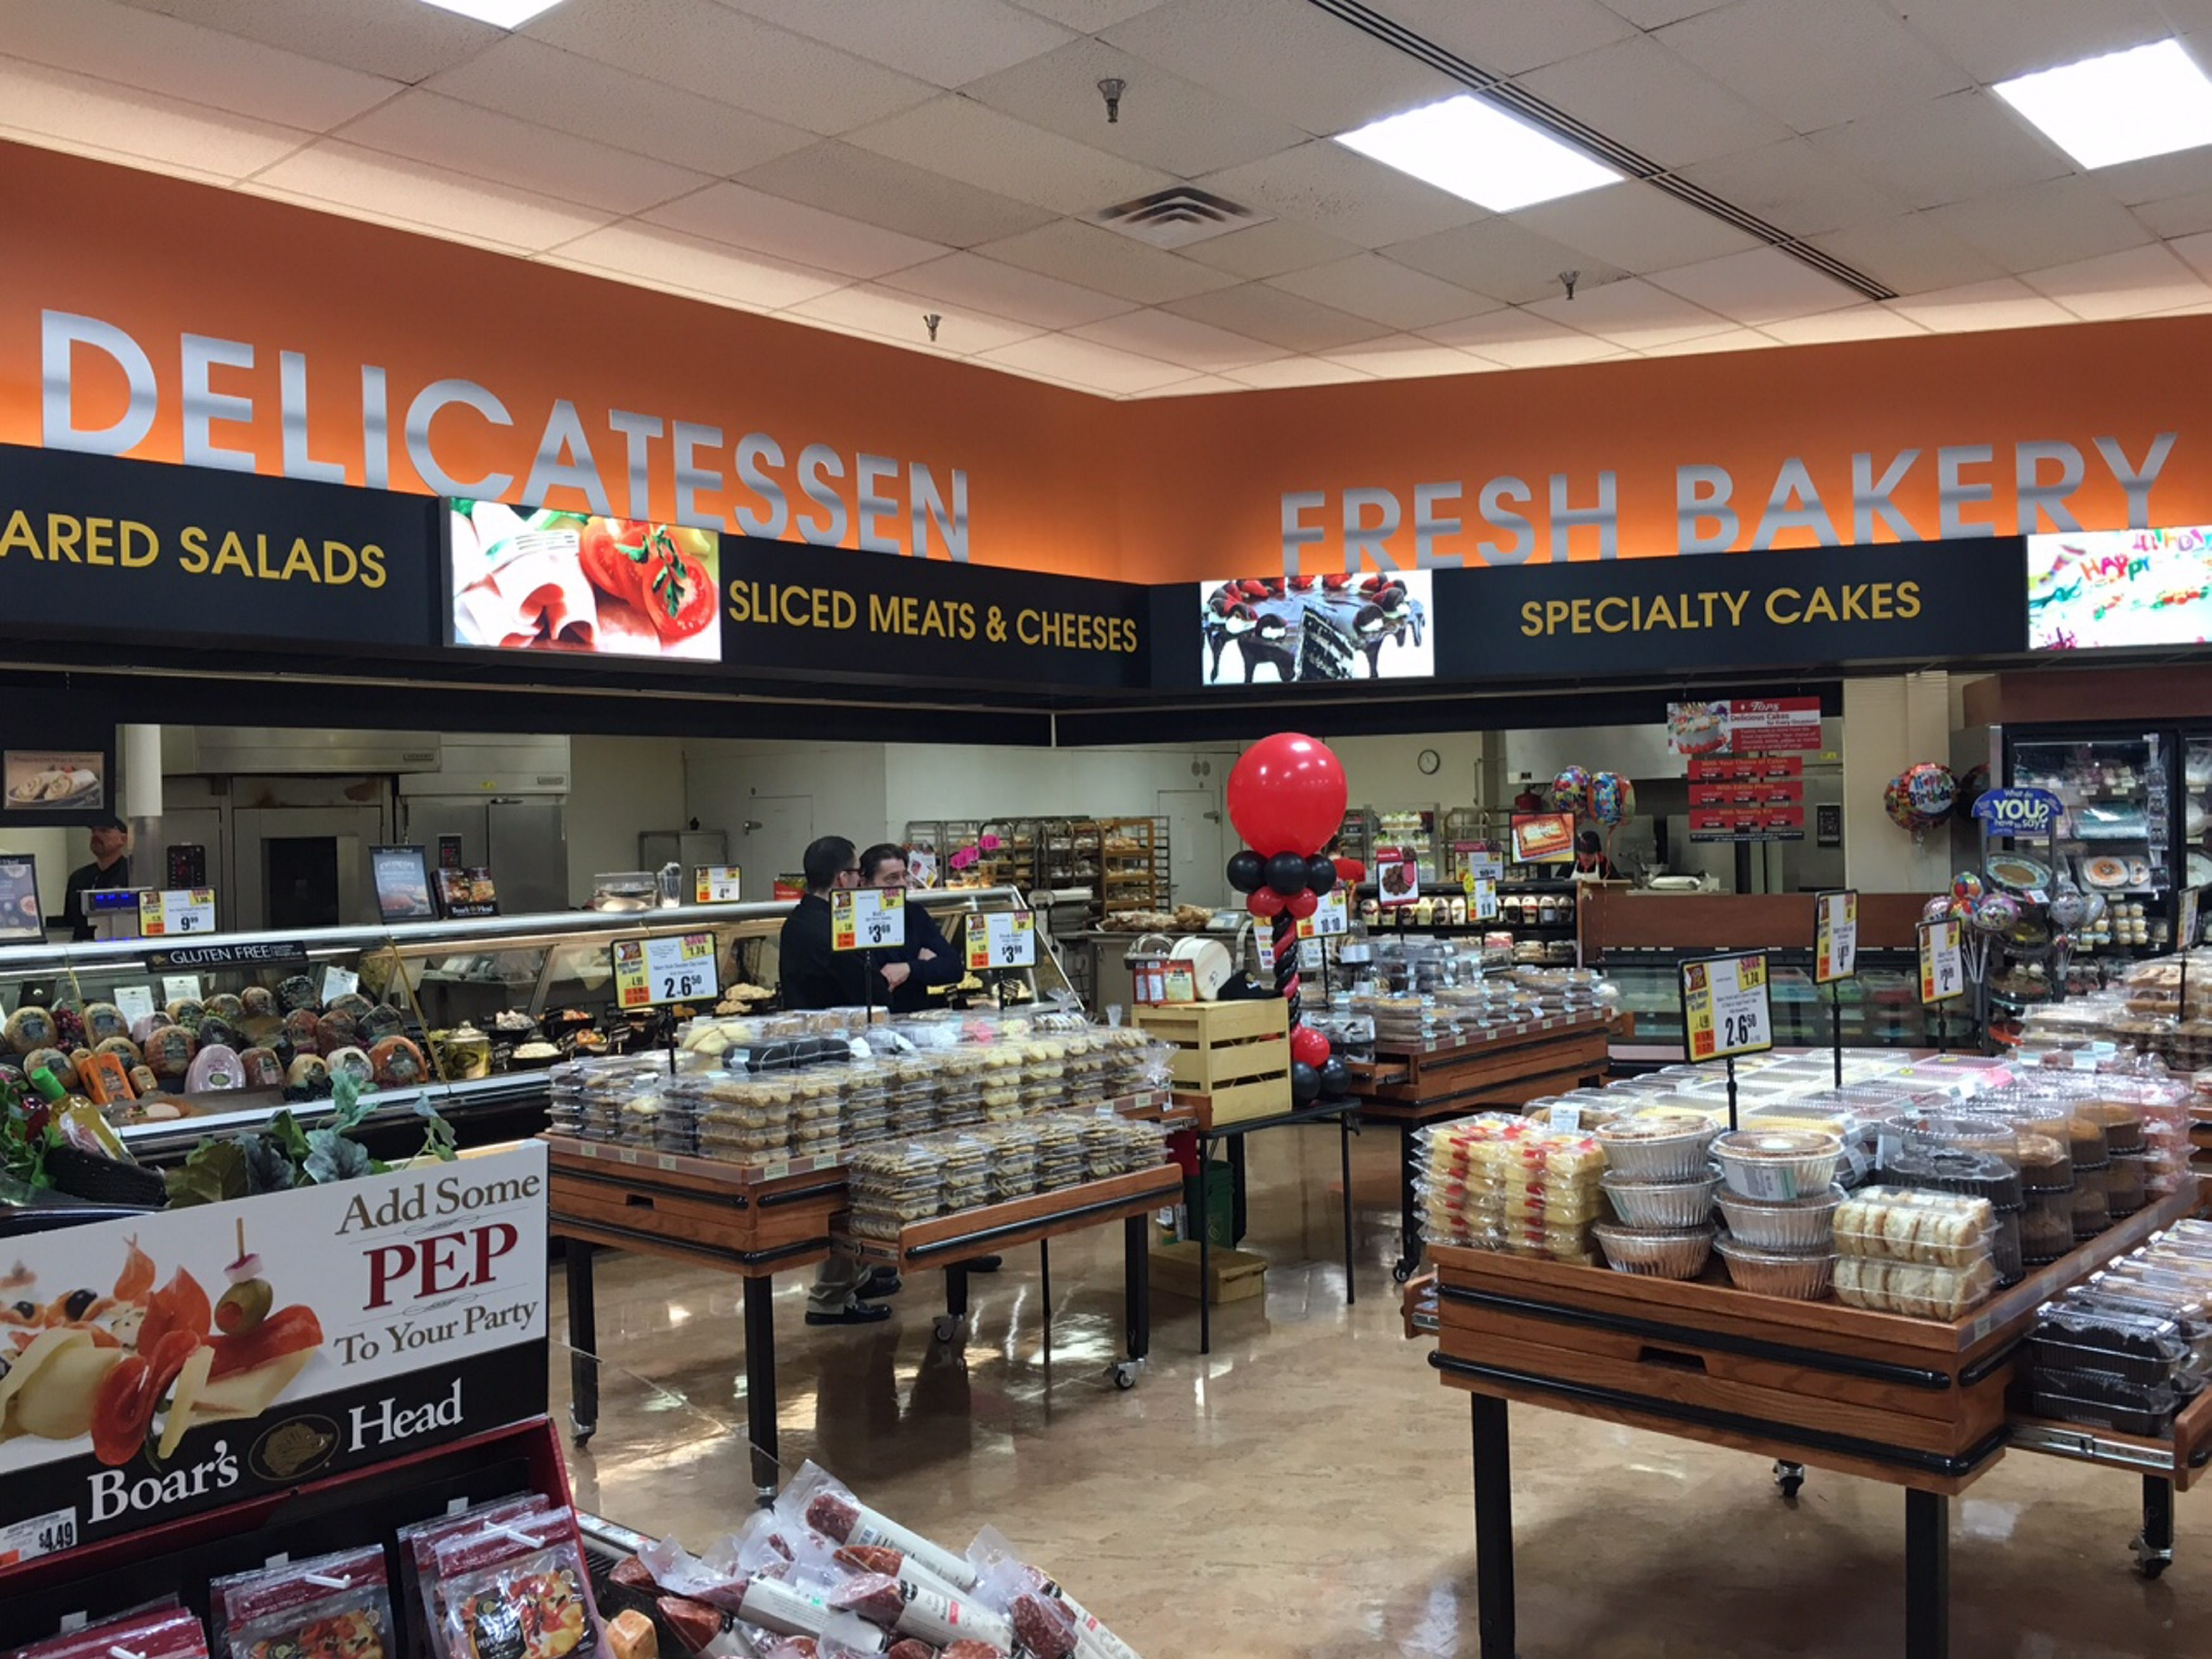 The renovated Tops store in Farmington, near Riochester, includes a new bakery and deli.